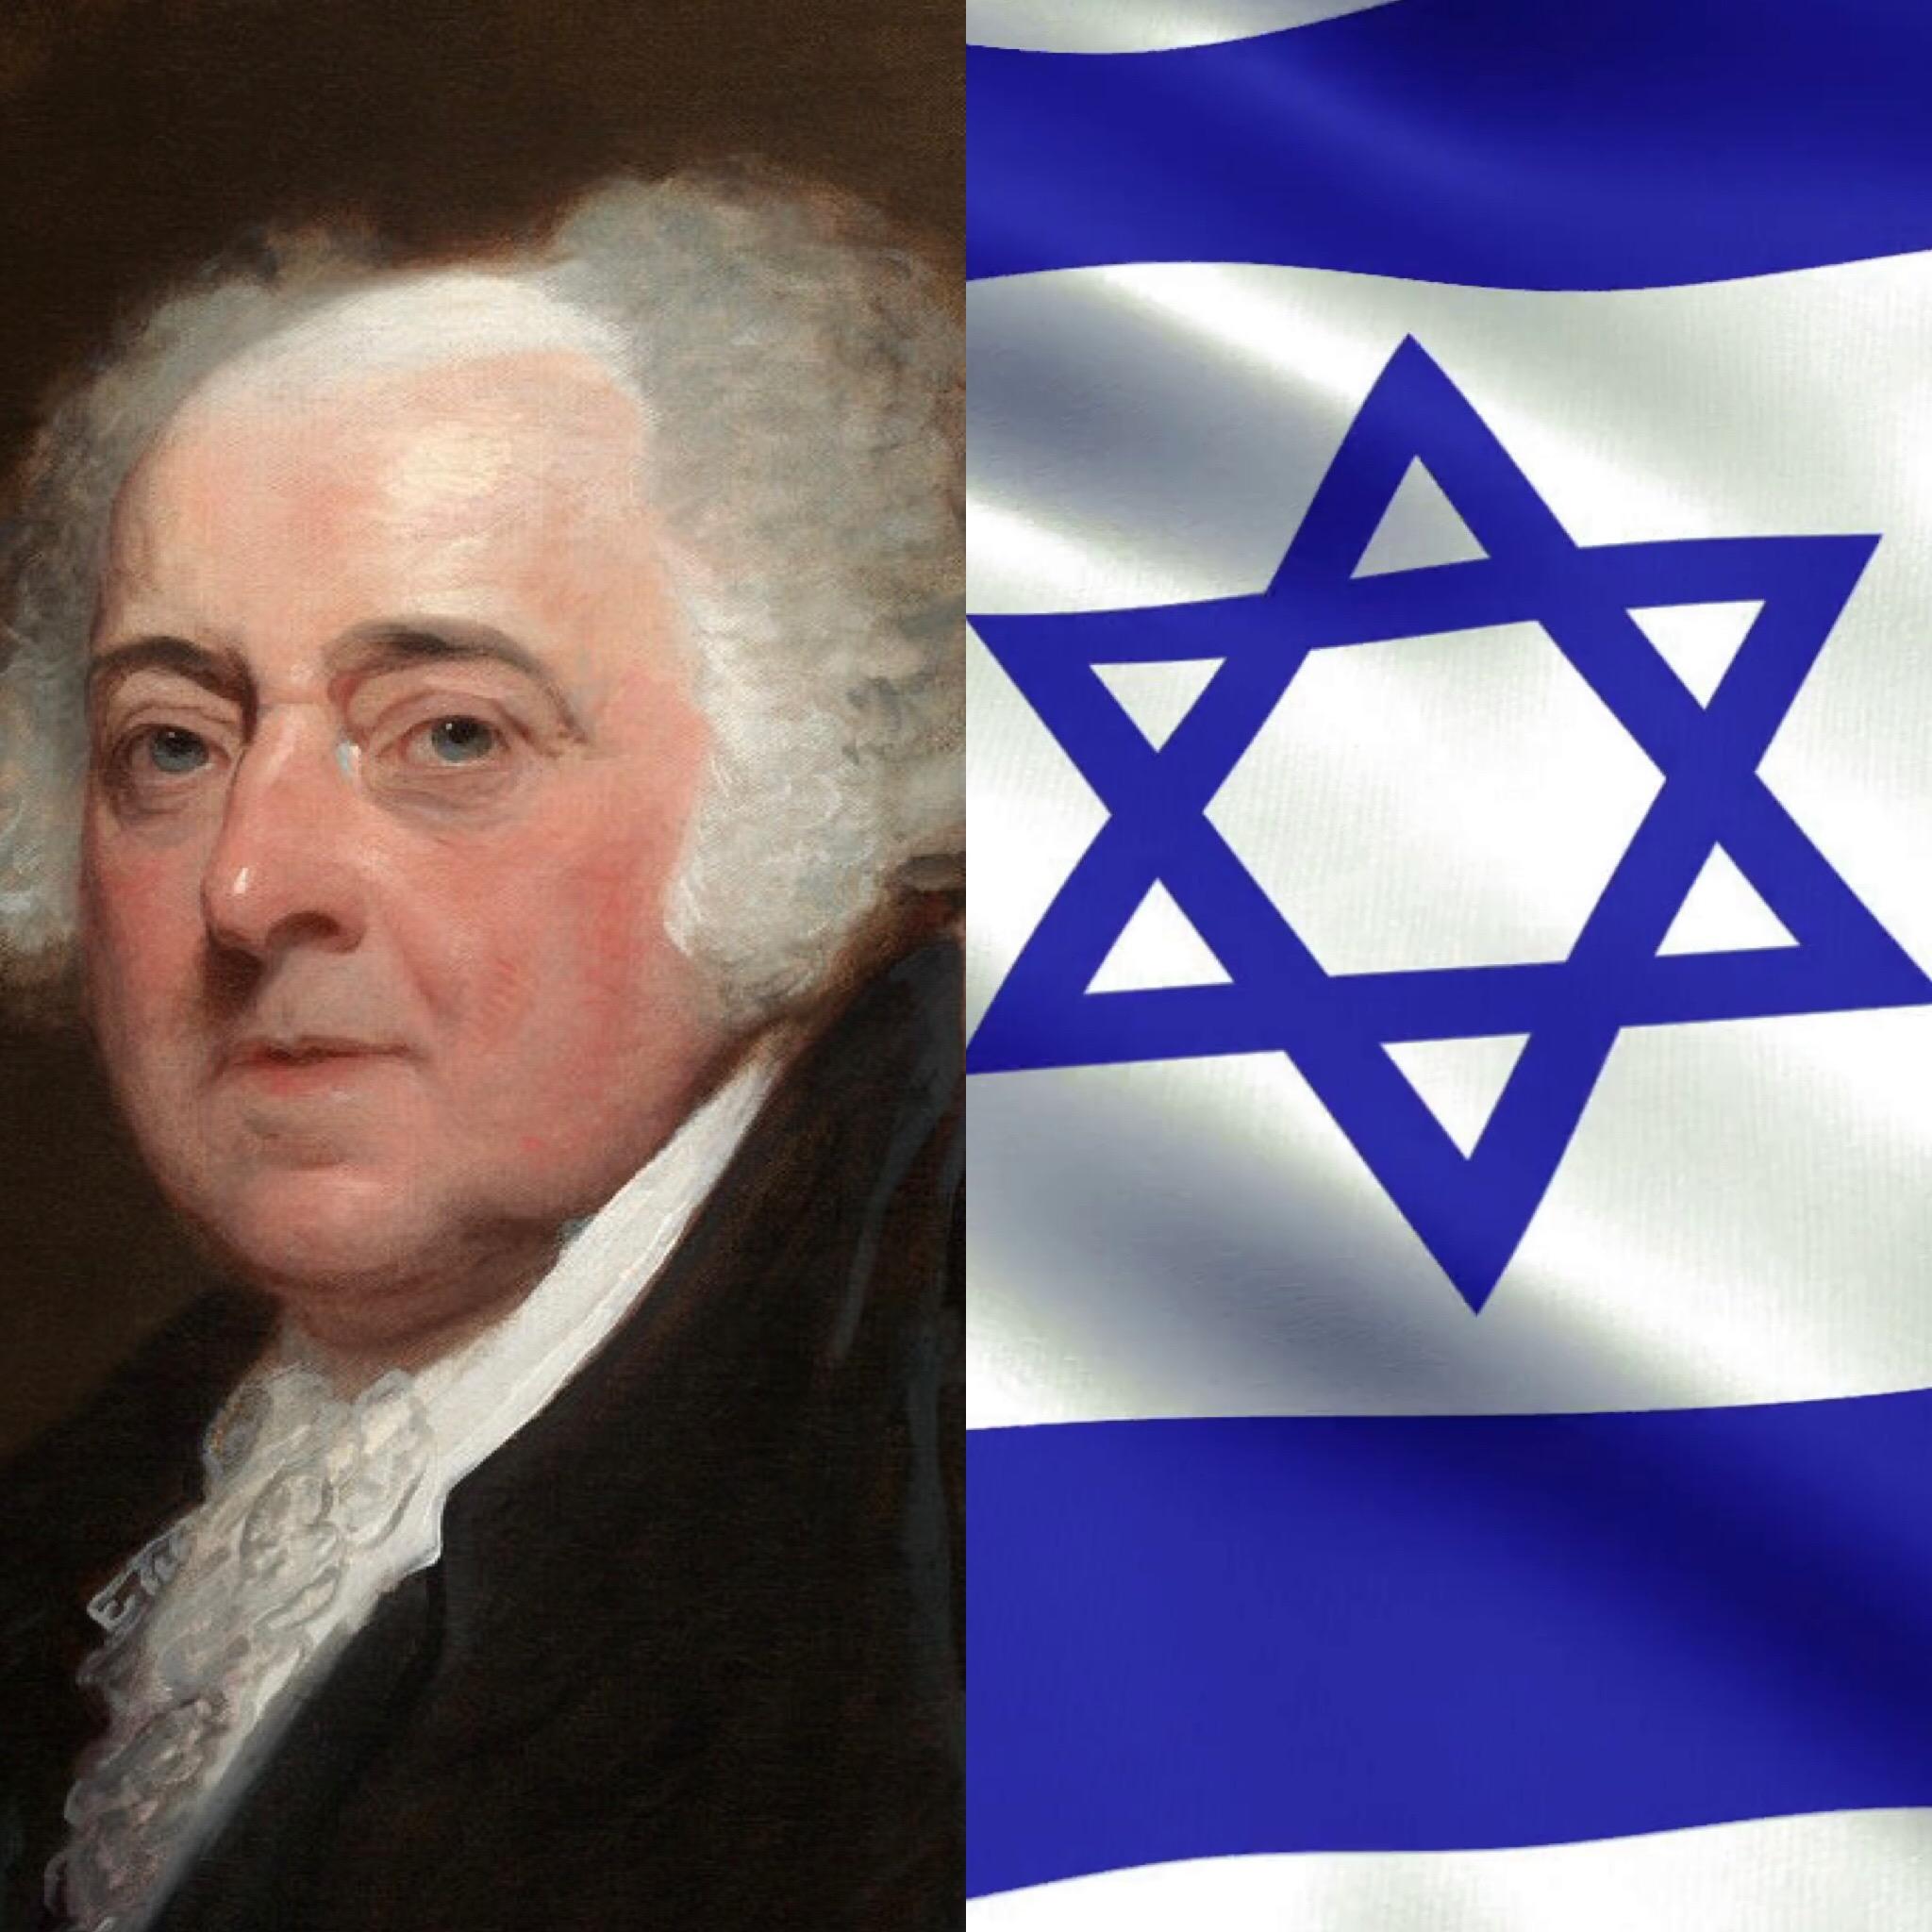 Adams, Zionism.jpeg